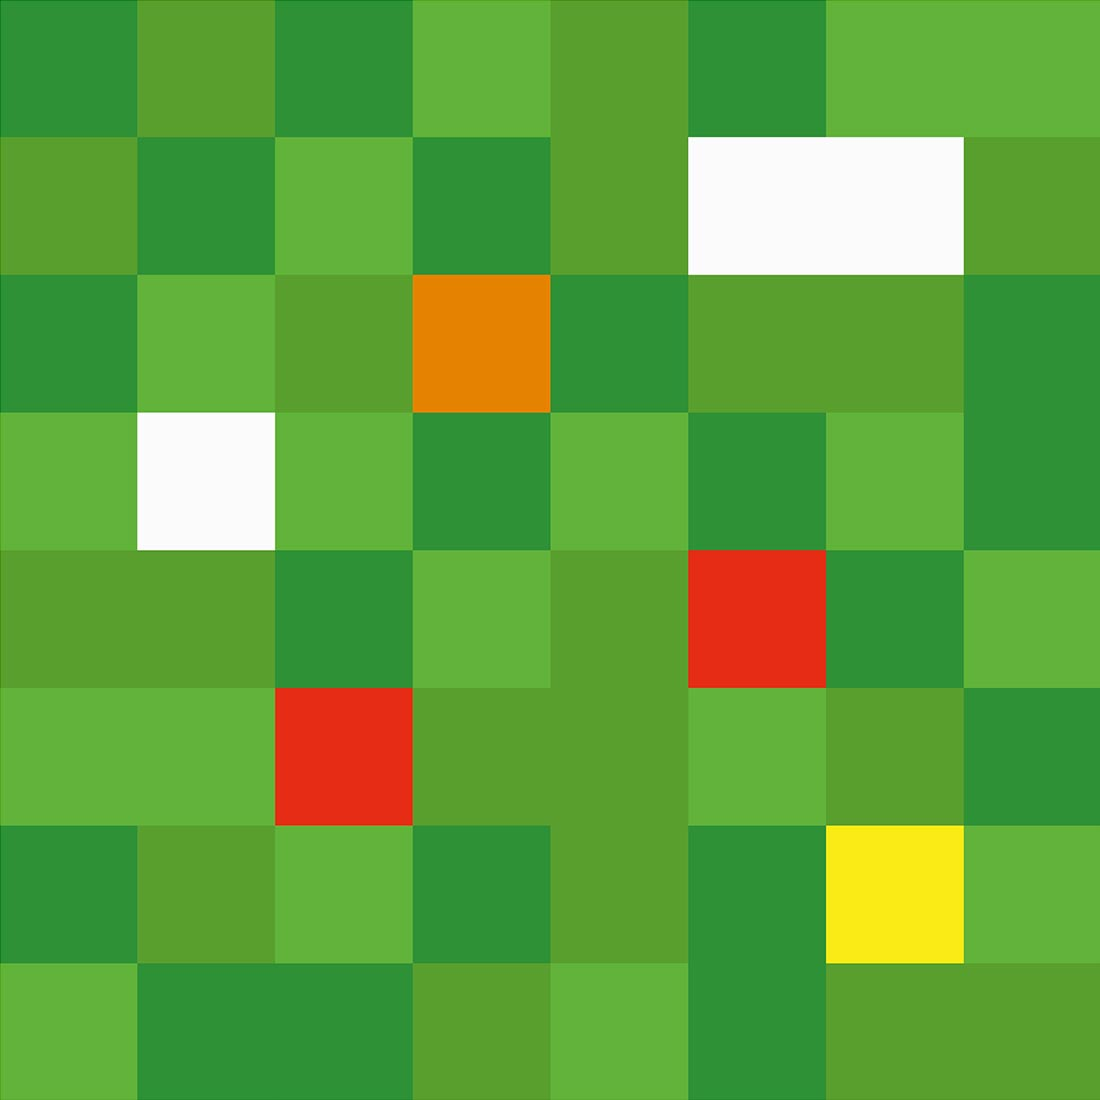 scrambled-videogame-charakters_16